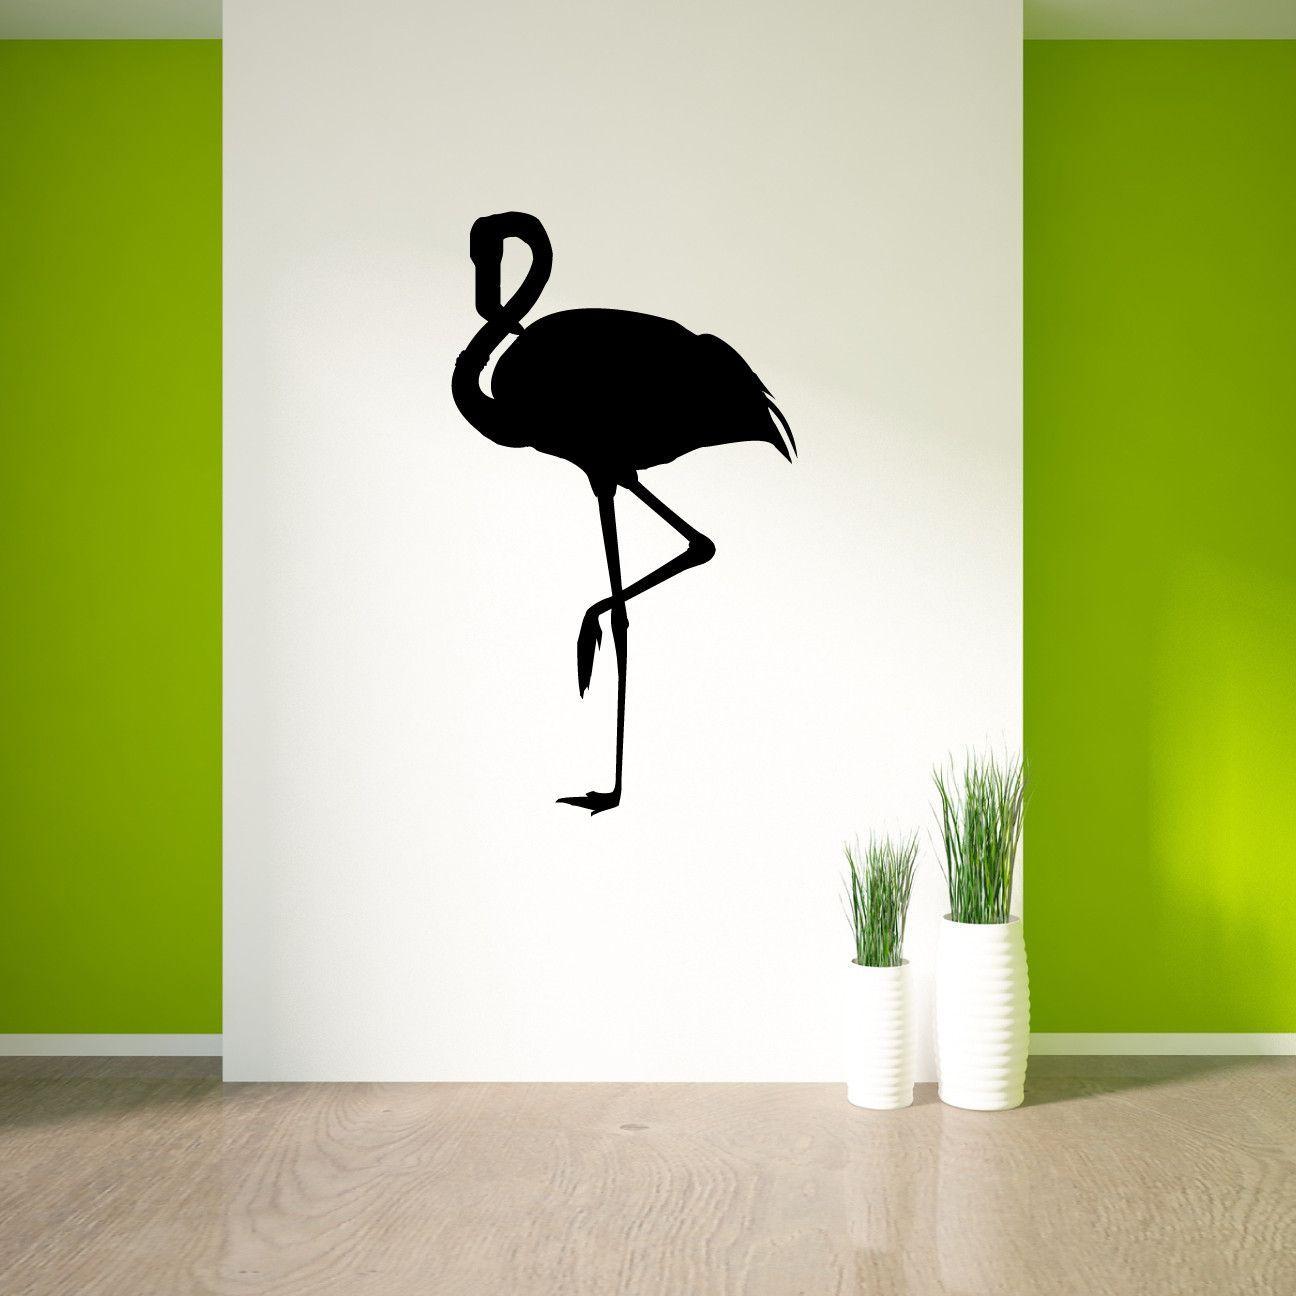 Flamingo Bird Wall Decal Sticker 78